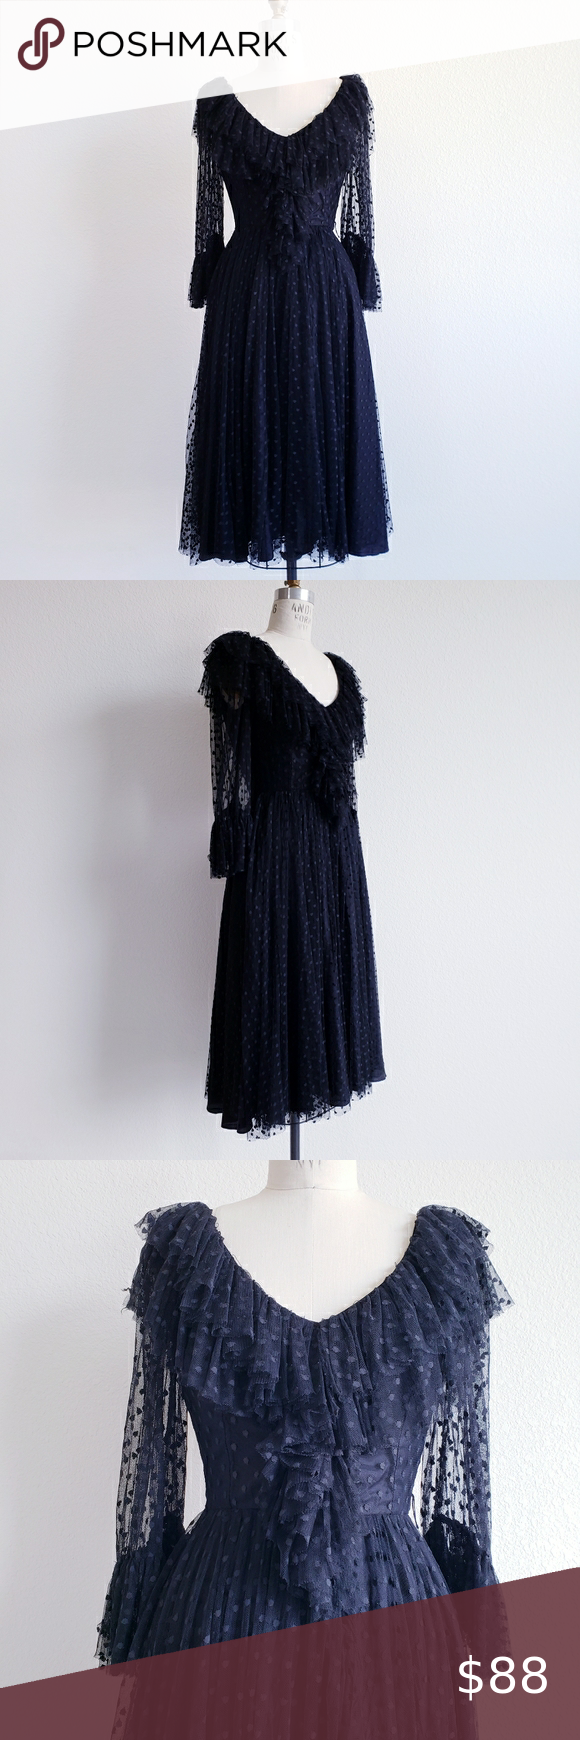 Vintage 70s Miss Ashlee Black Dotted Net Dress Net Dress Small Dress Dresses [ 1740 x 580 Pixel ]